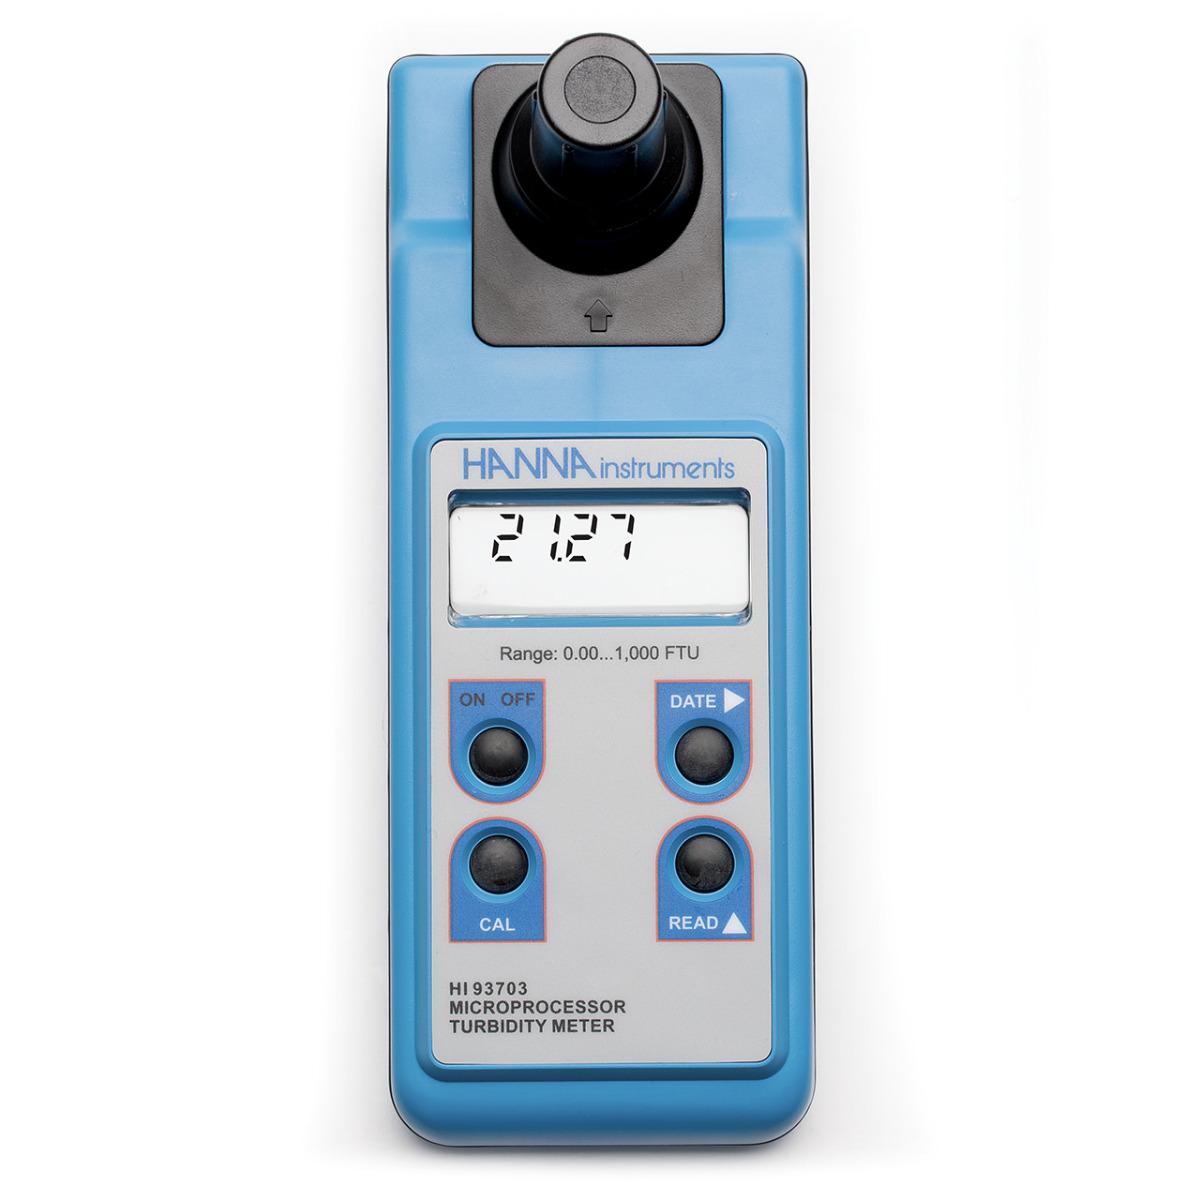 HI93703-11 Portable Turbidity Meter ISO Compliant